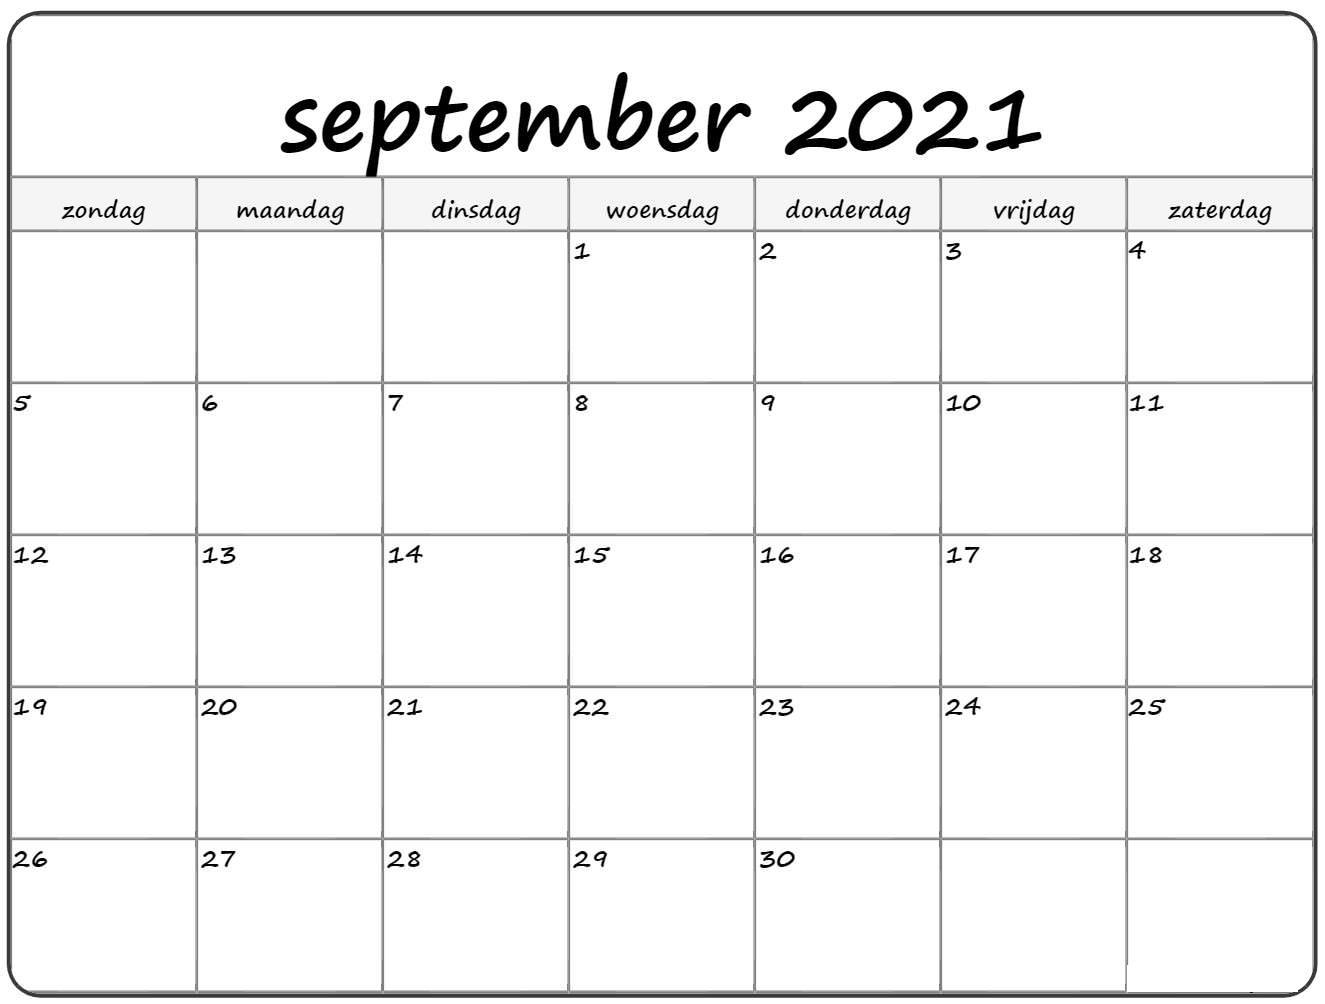 Kalender Feiertage Vorlage fur September 2021